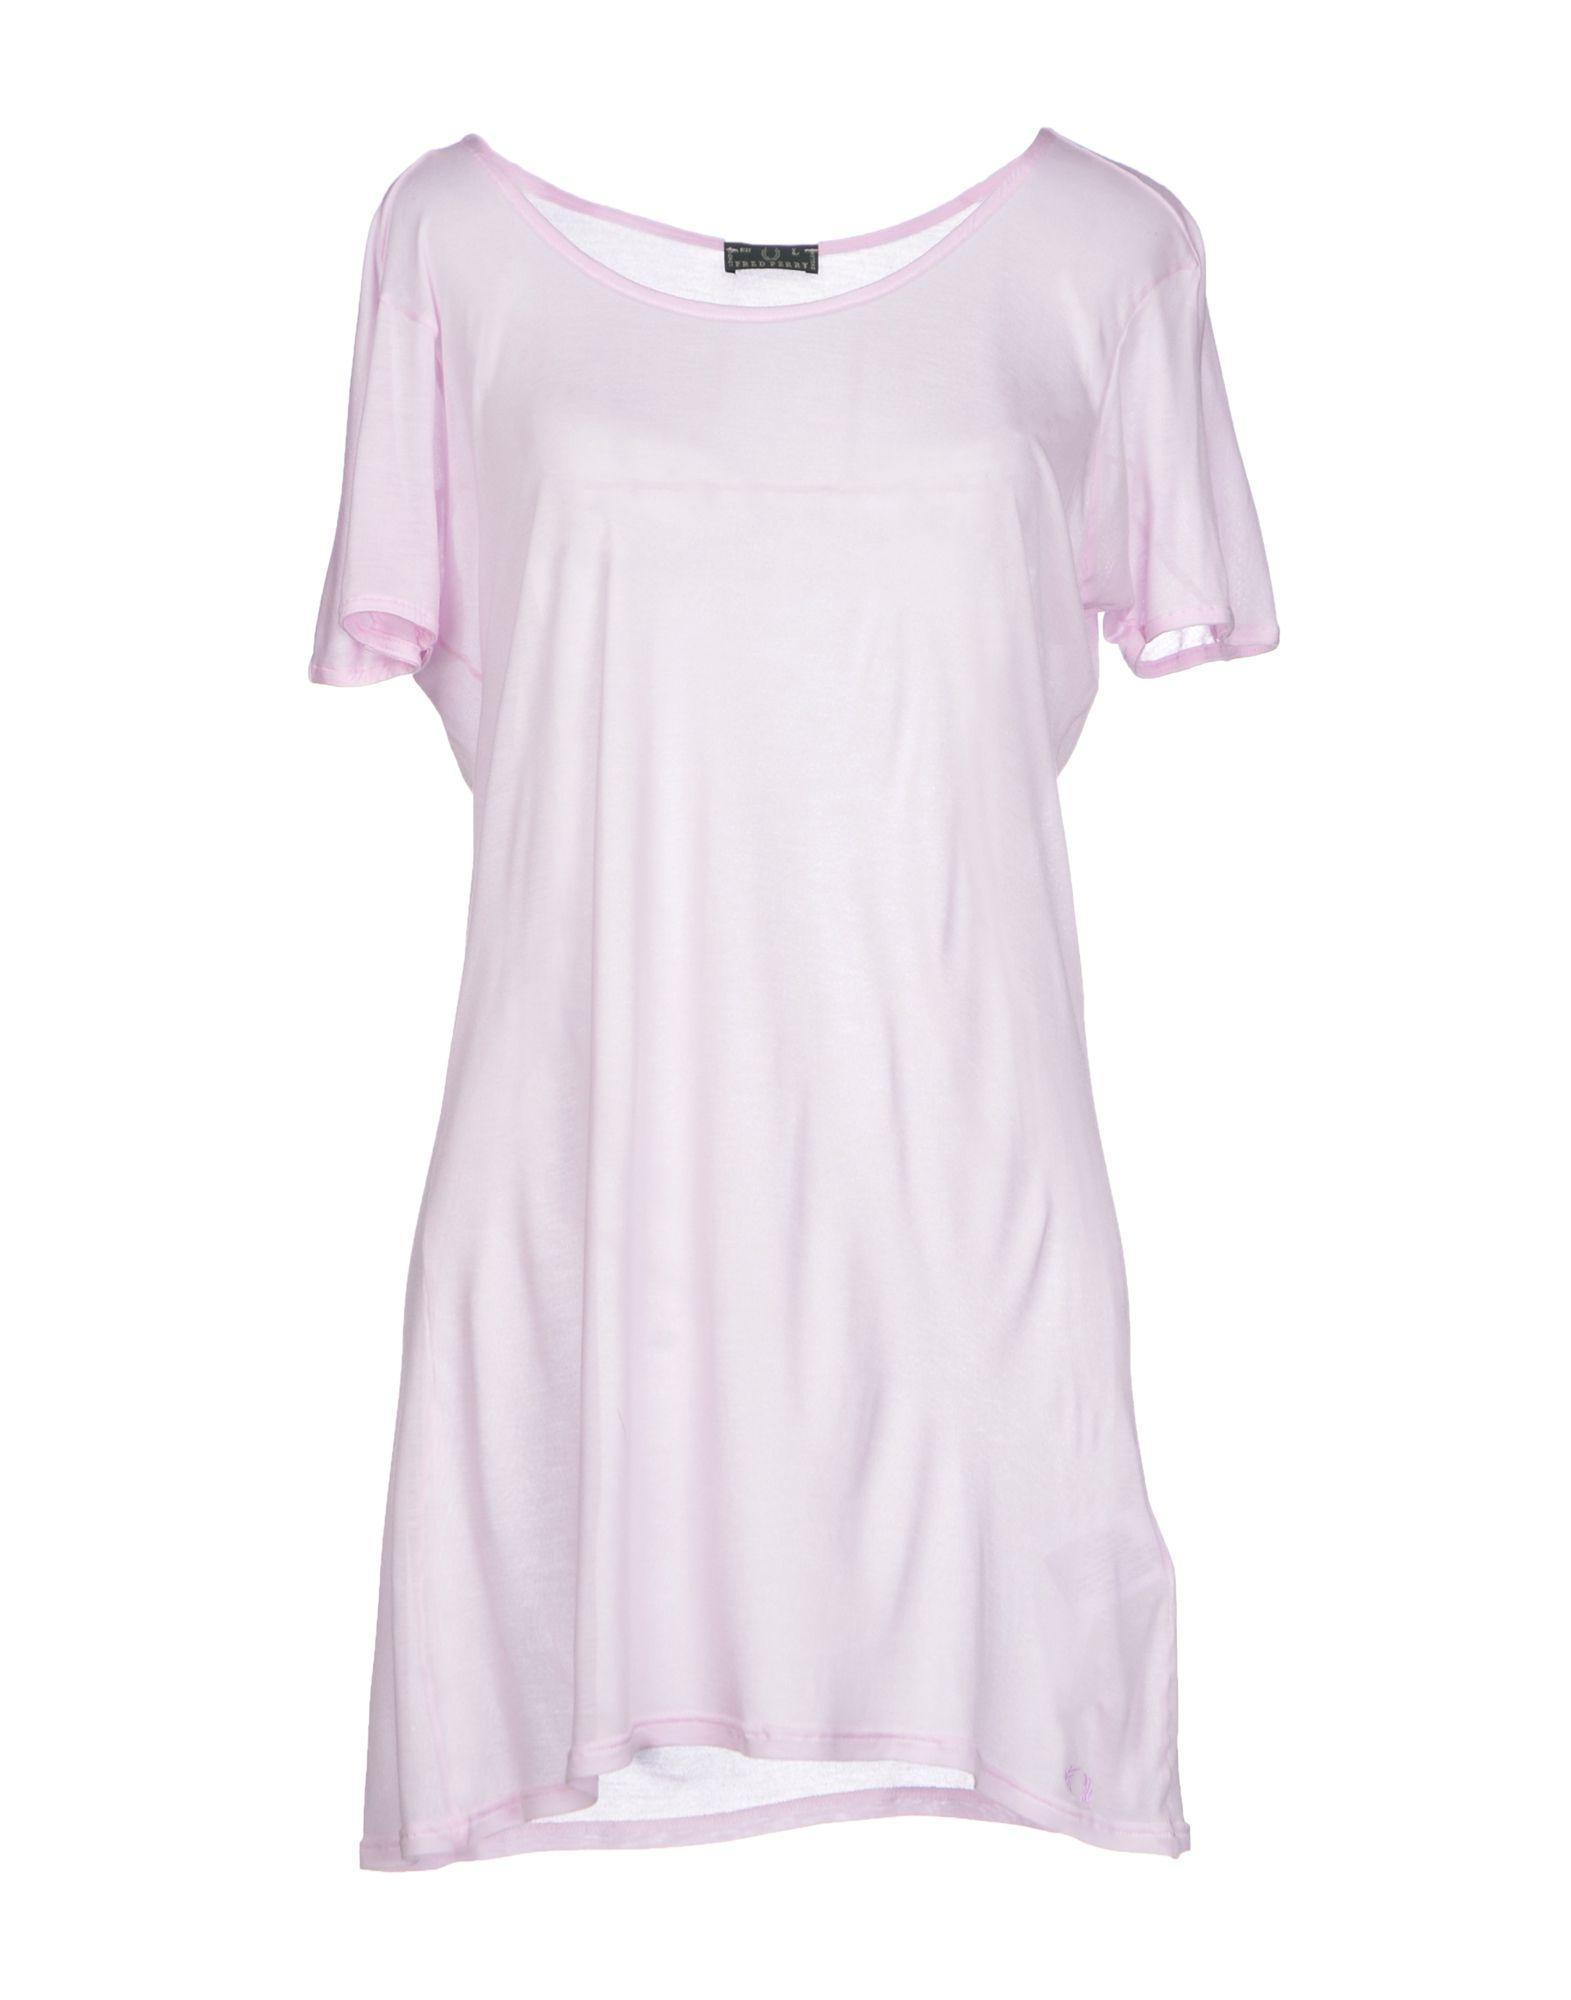 FRED PERRY Damen T-shirts Farbe Rosa Größe 4